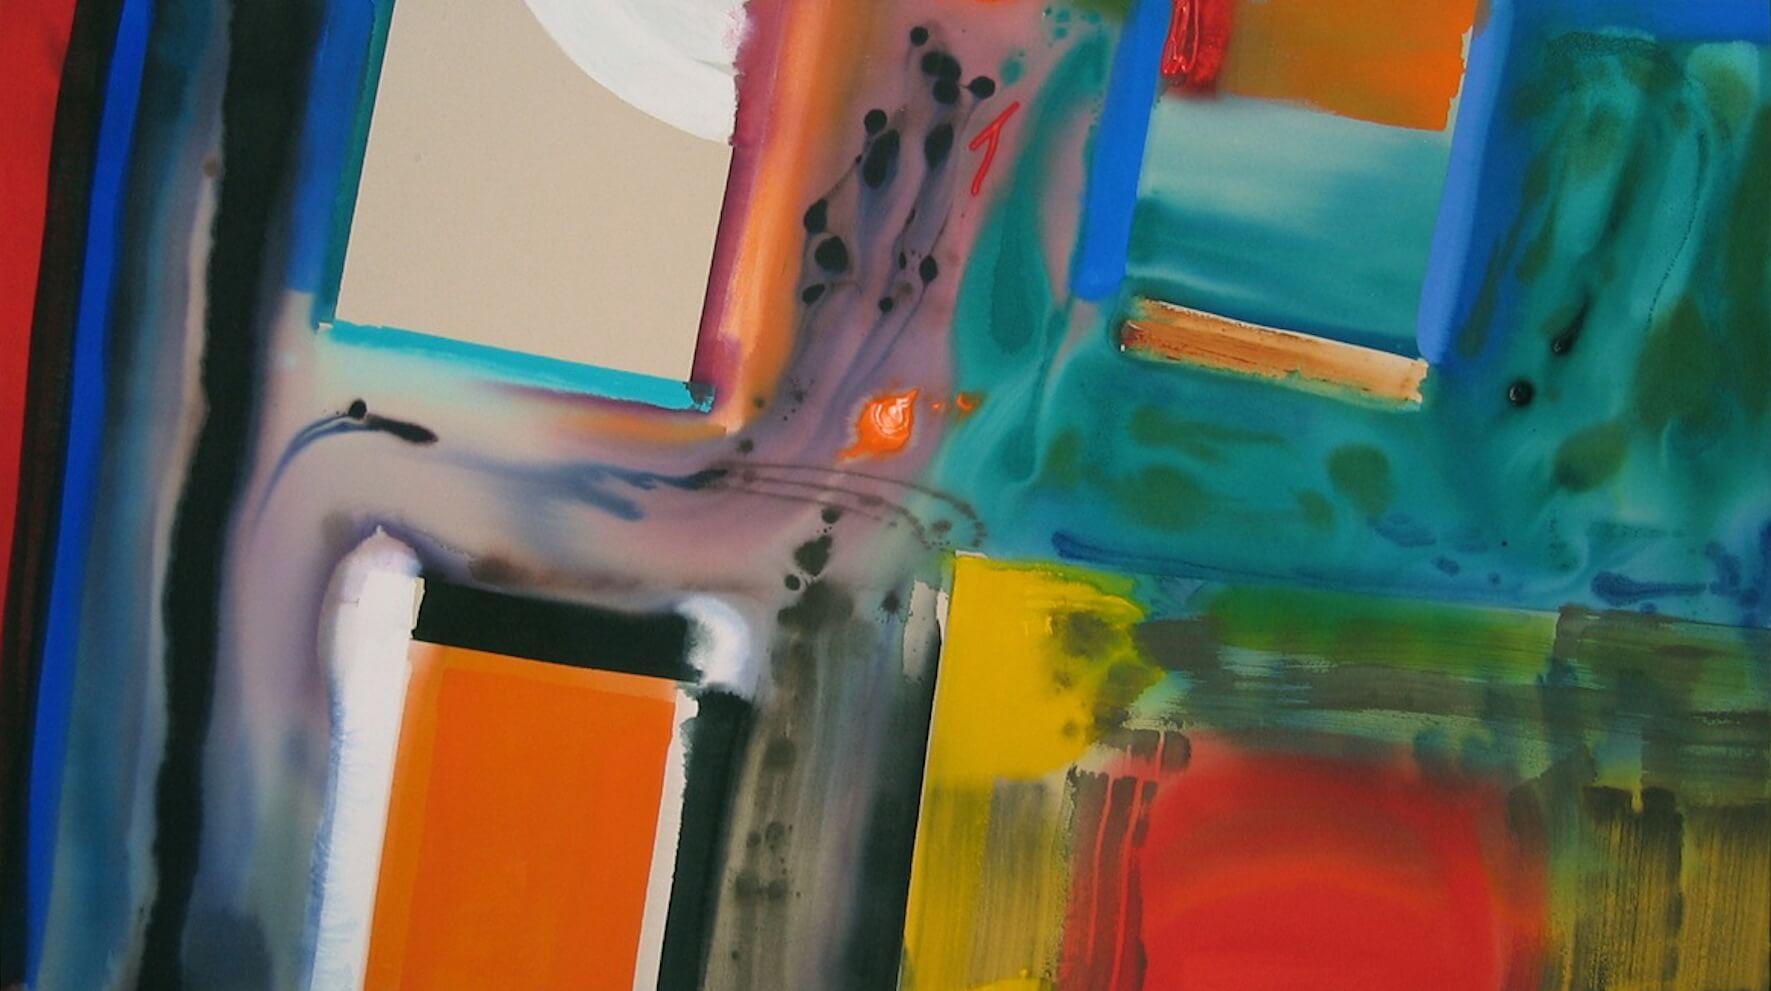 Patrick Jones, No Pasaran, 2010, 60 x 90 inches, acrylic on canvas (courtesy of